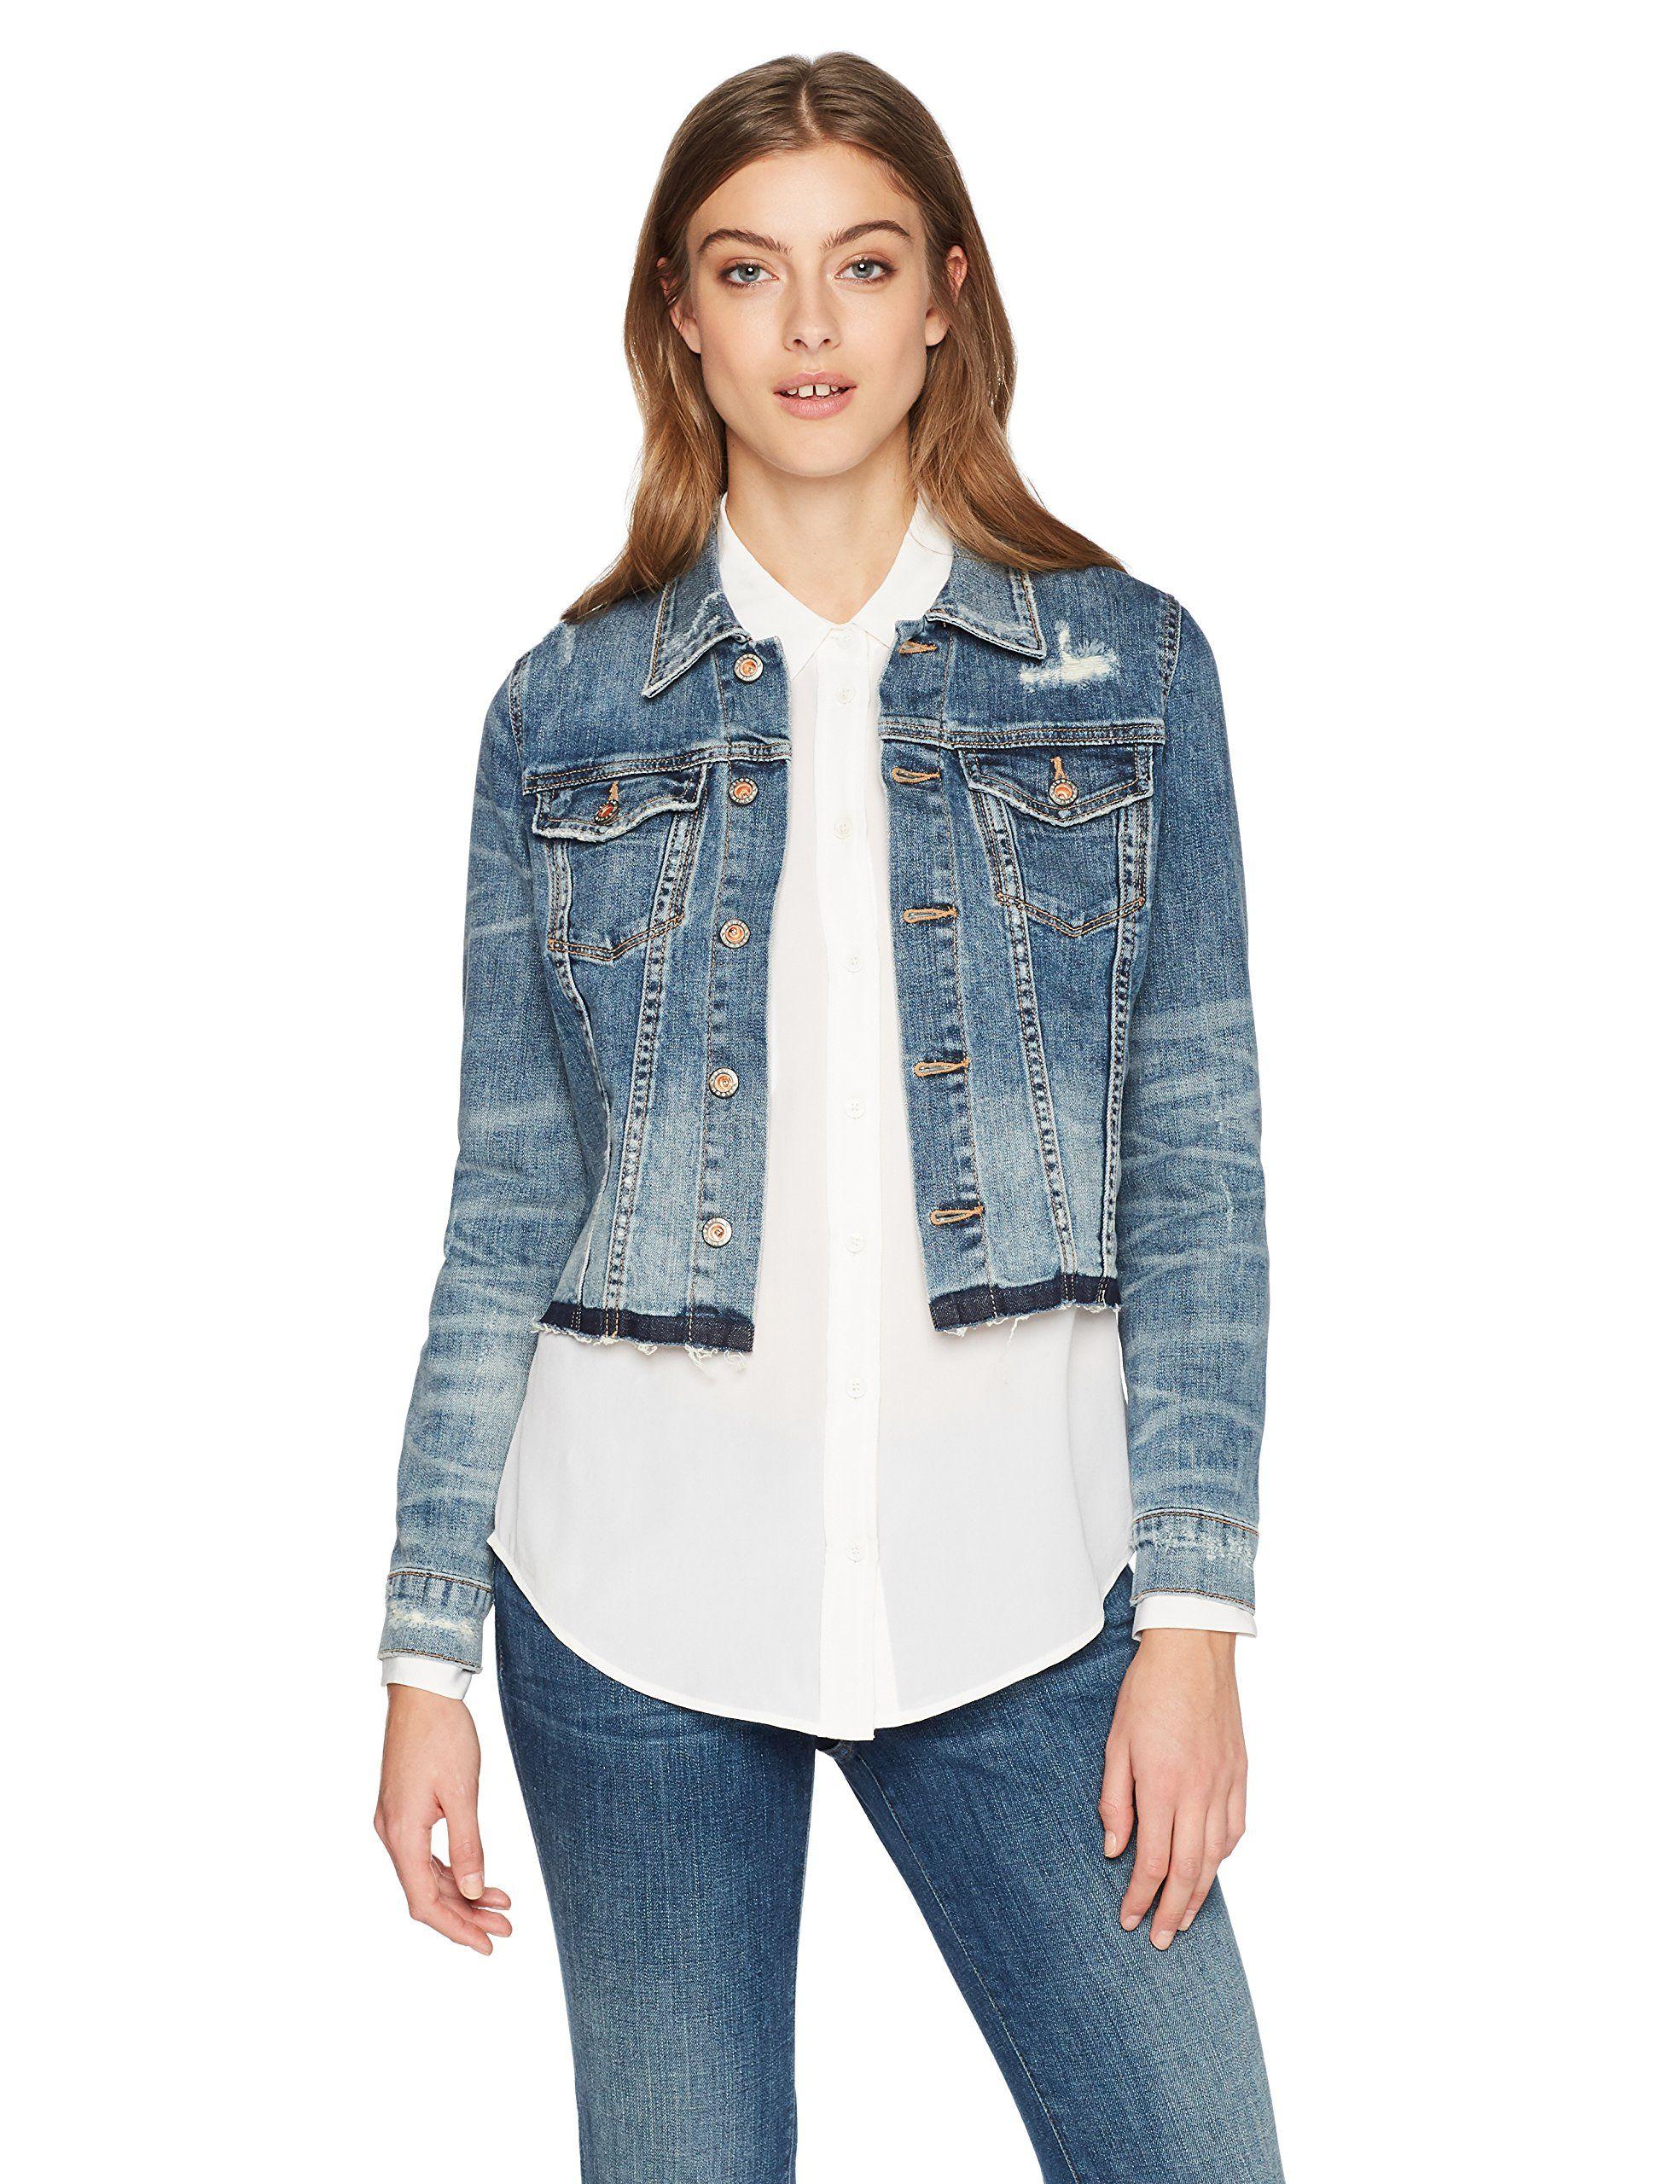 Denim Bloom Womens Deep Blue Color With Frayed Hem Denim Jacket Xs Dark Blue Color More Info Could Be Found At Denim Jacket Women Denim Fashion Women Jeans [ 2560 x 1969 Pixel ]